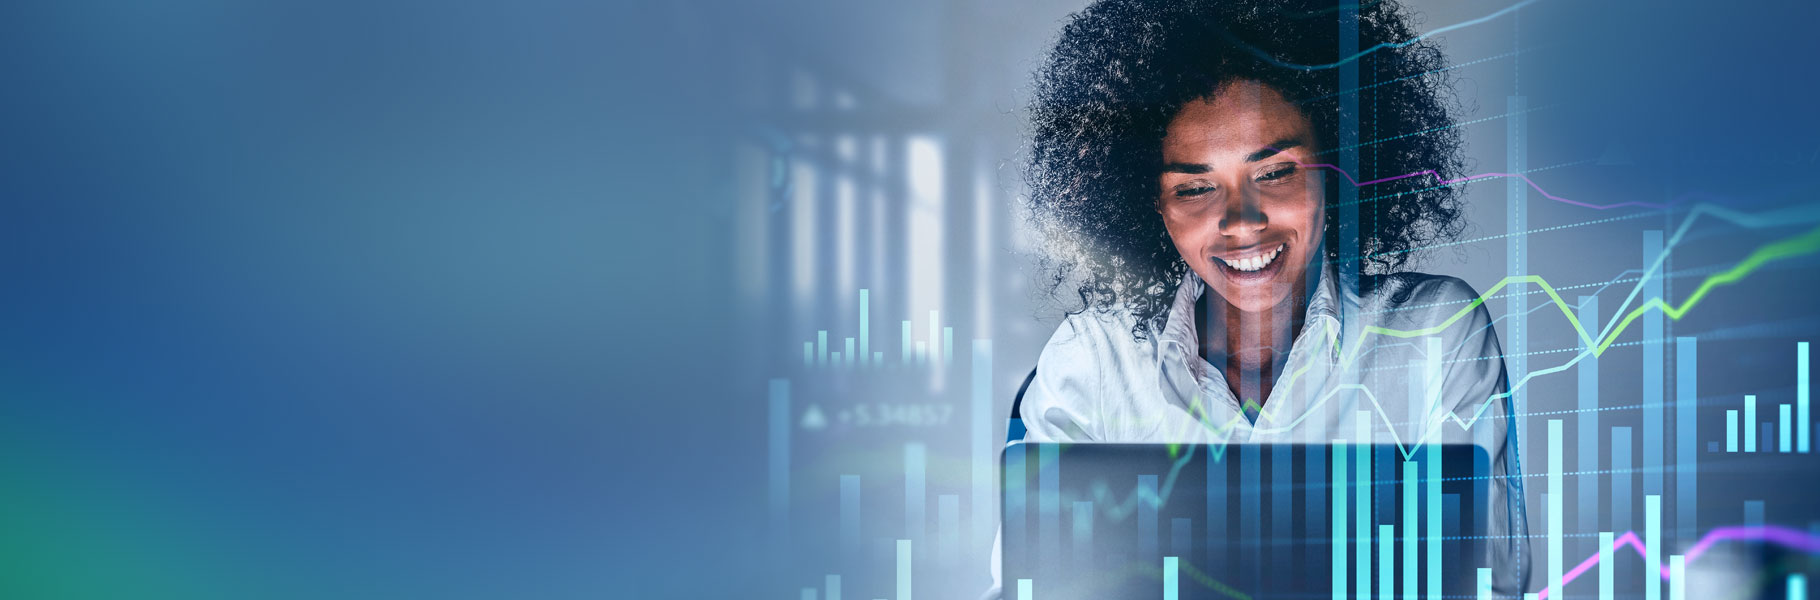 CTSI Offering Virtual Clinical Trialist Training 101